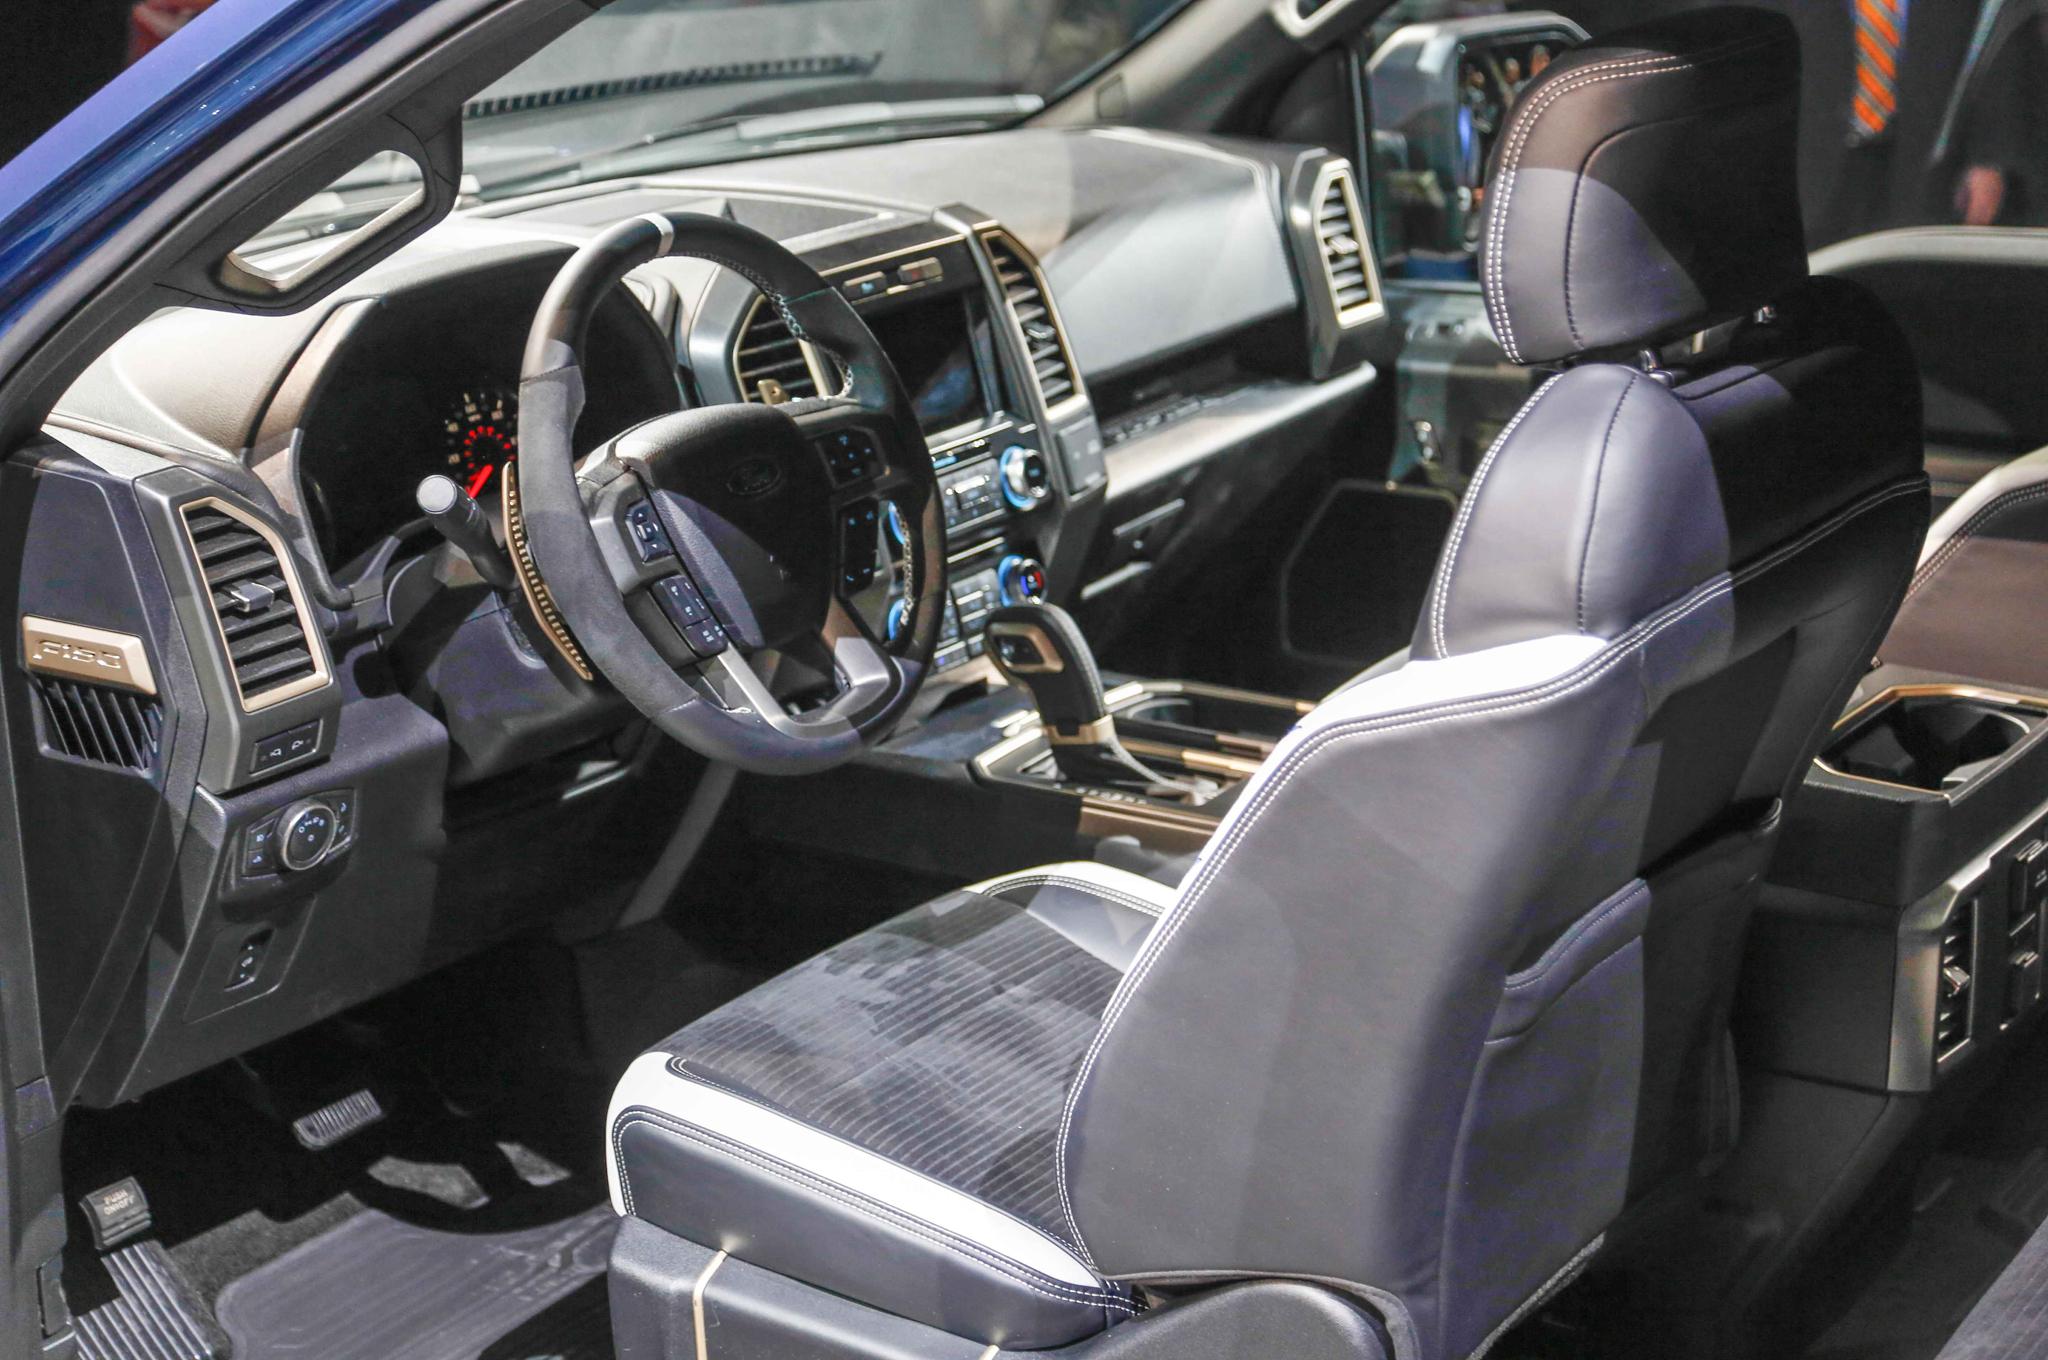 Raptor Facts - 2017 Ford F-150 Raptor Interior